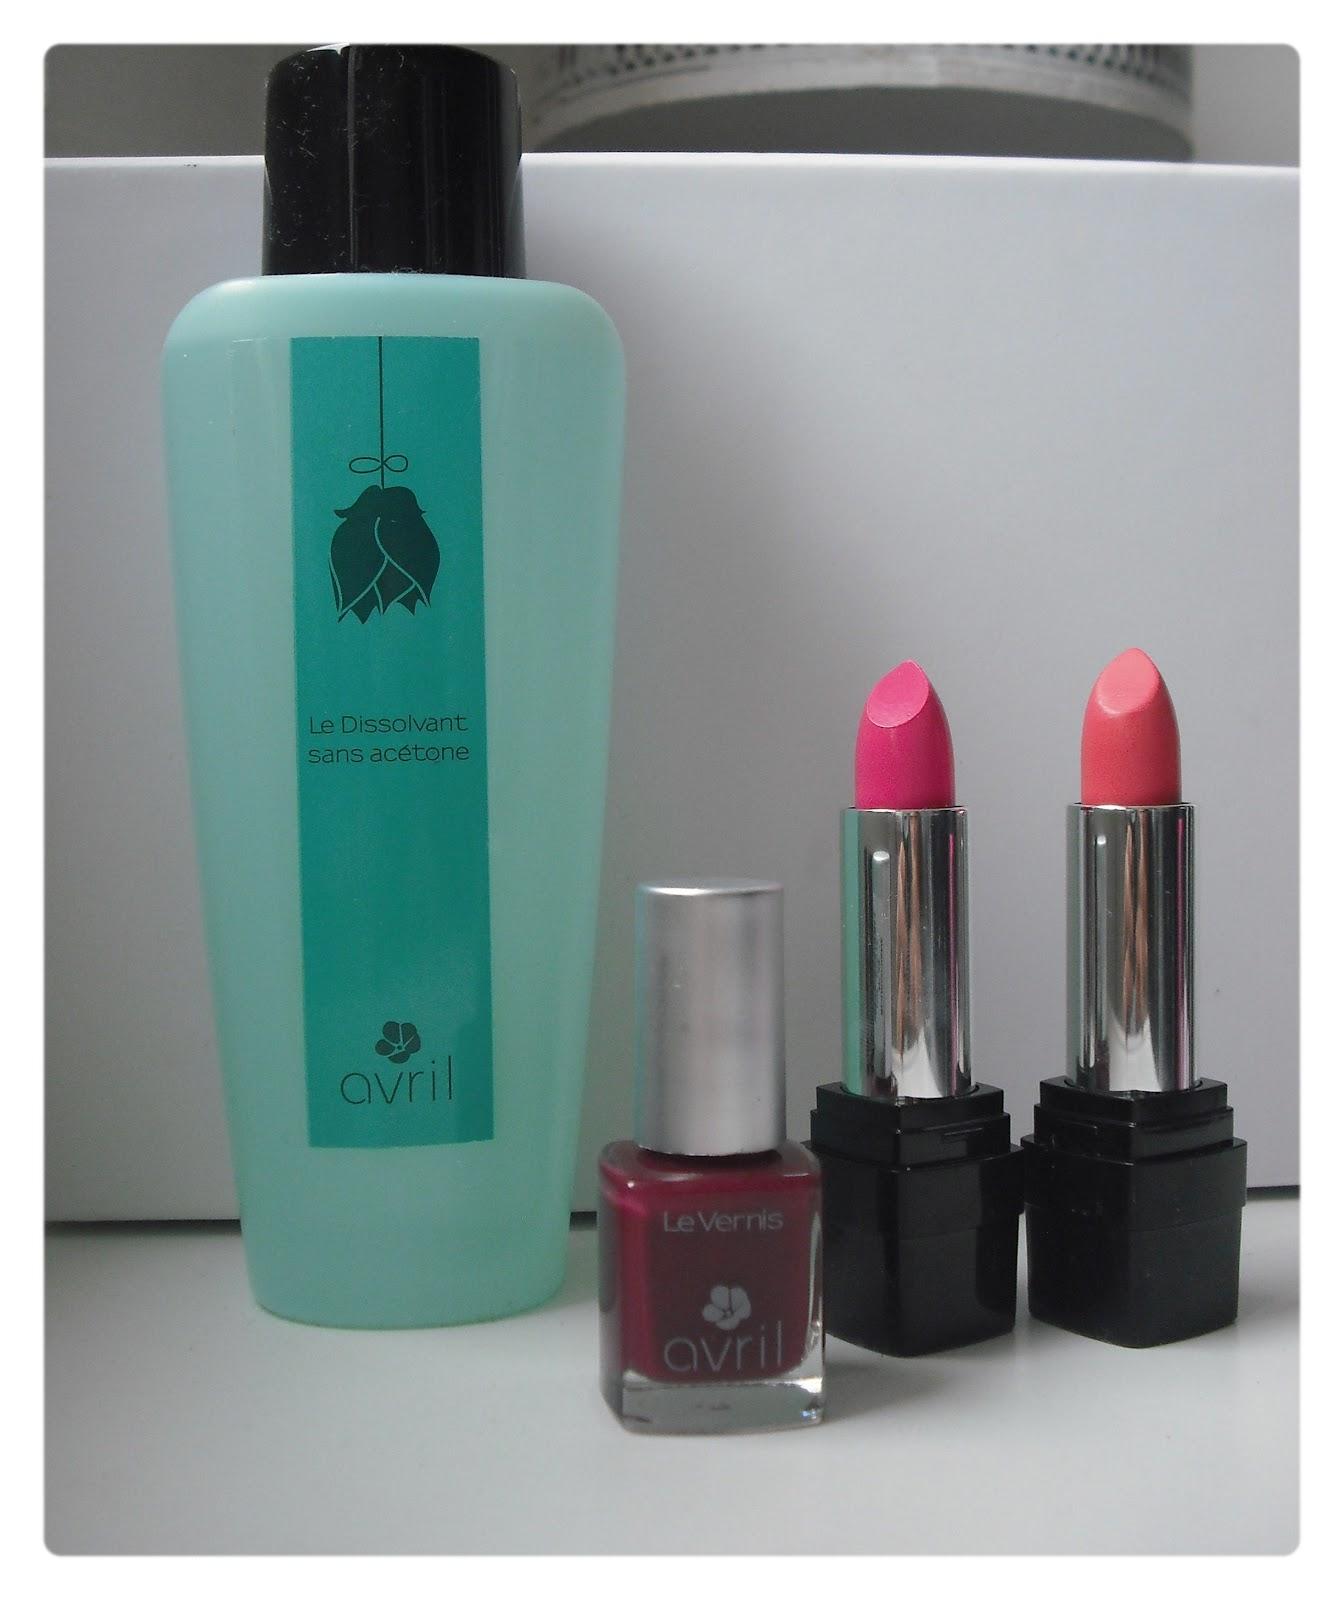 Ma 1 re commande avril maquillage je veux tout tester blog beaut mode et lifestyle n mes - Mondial relay nimes ...